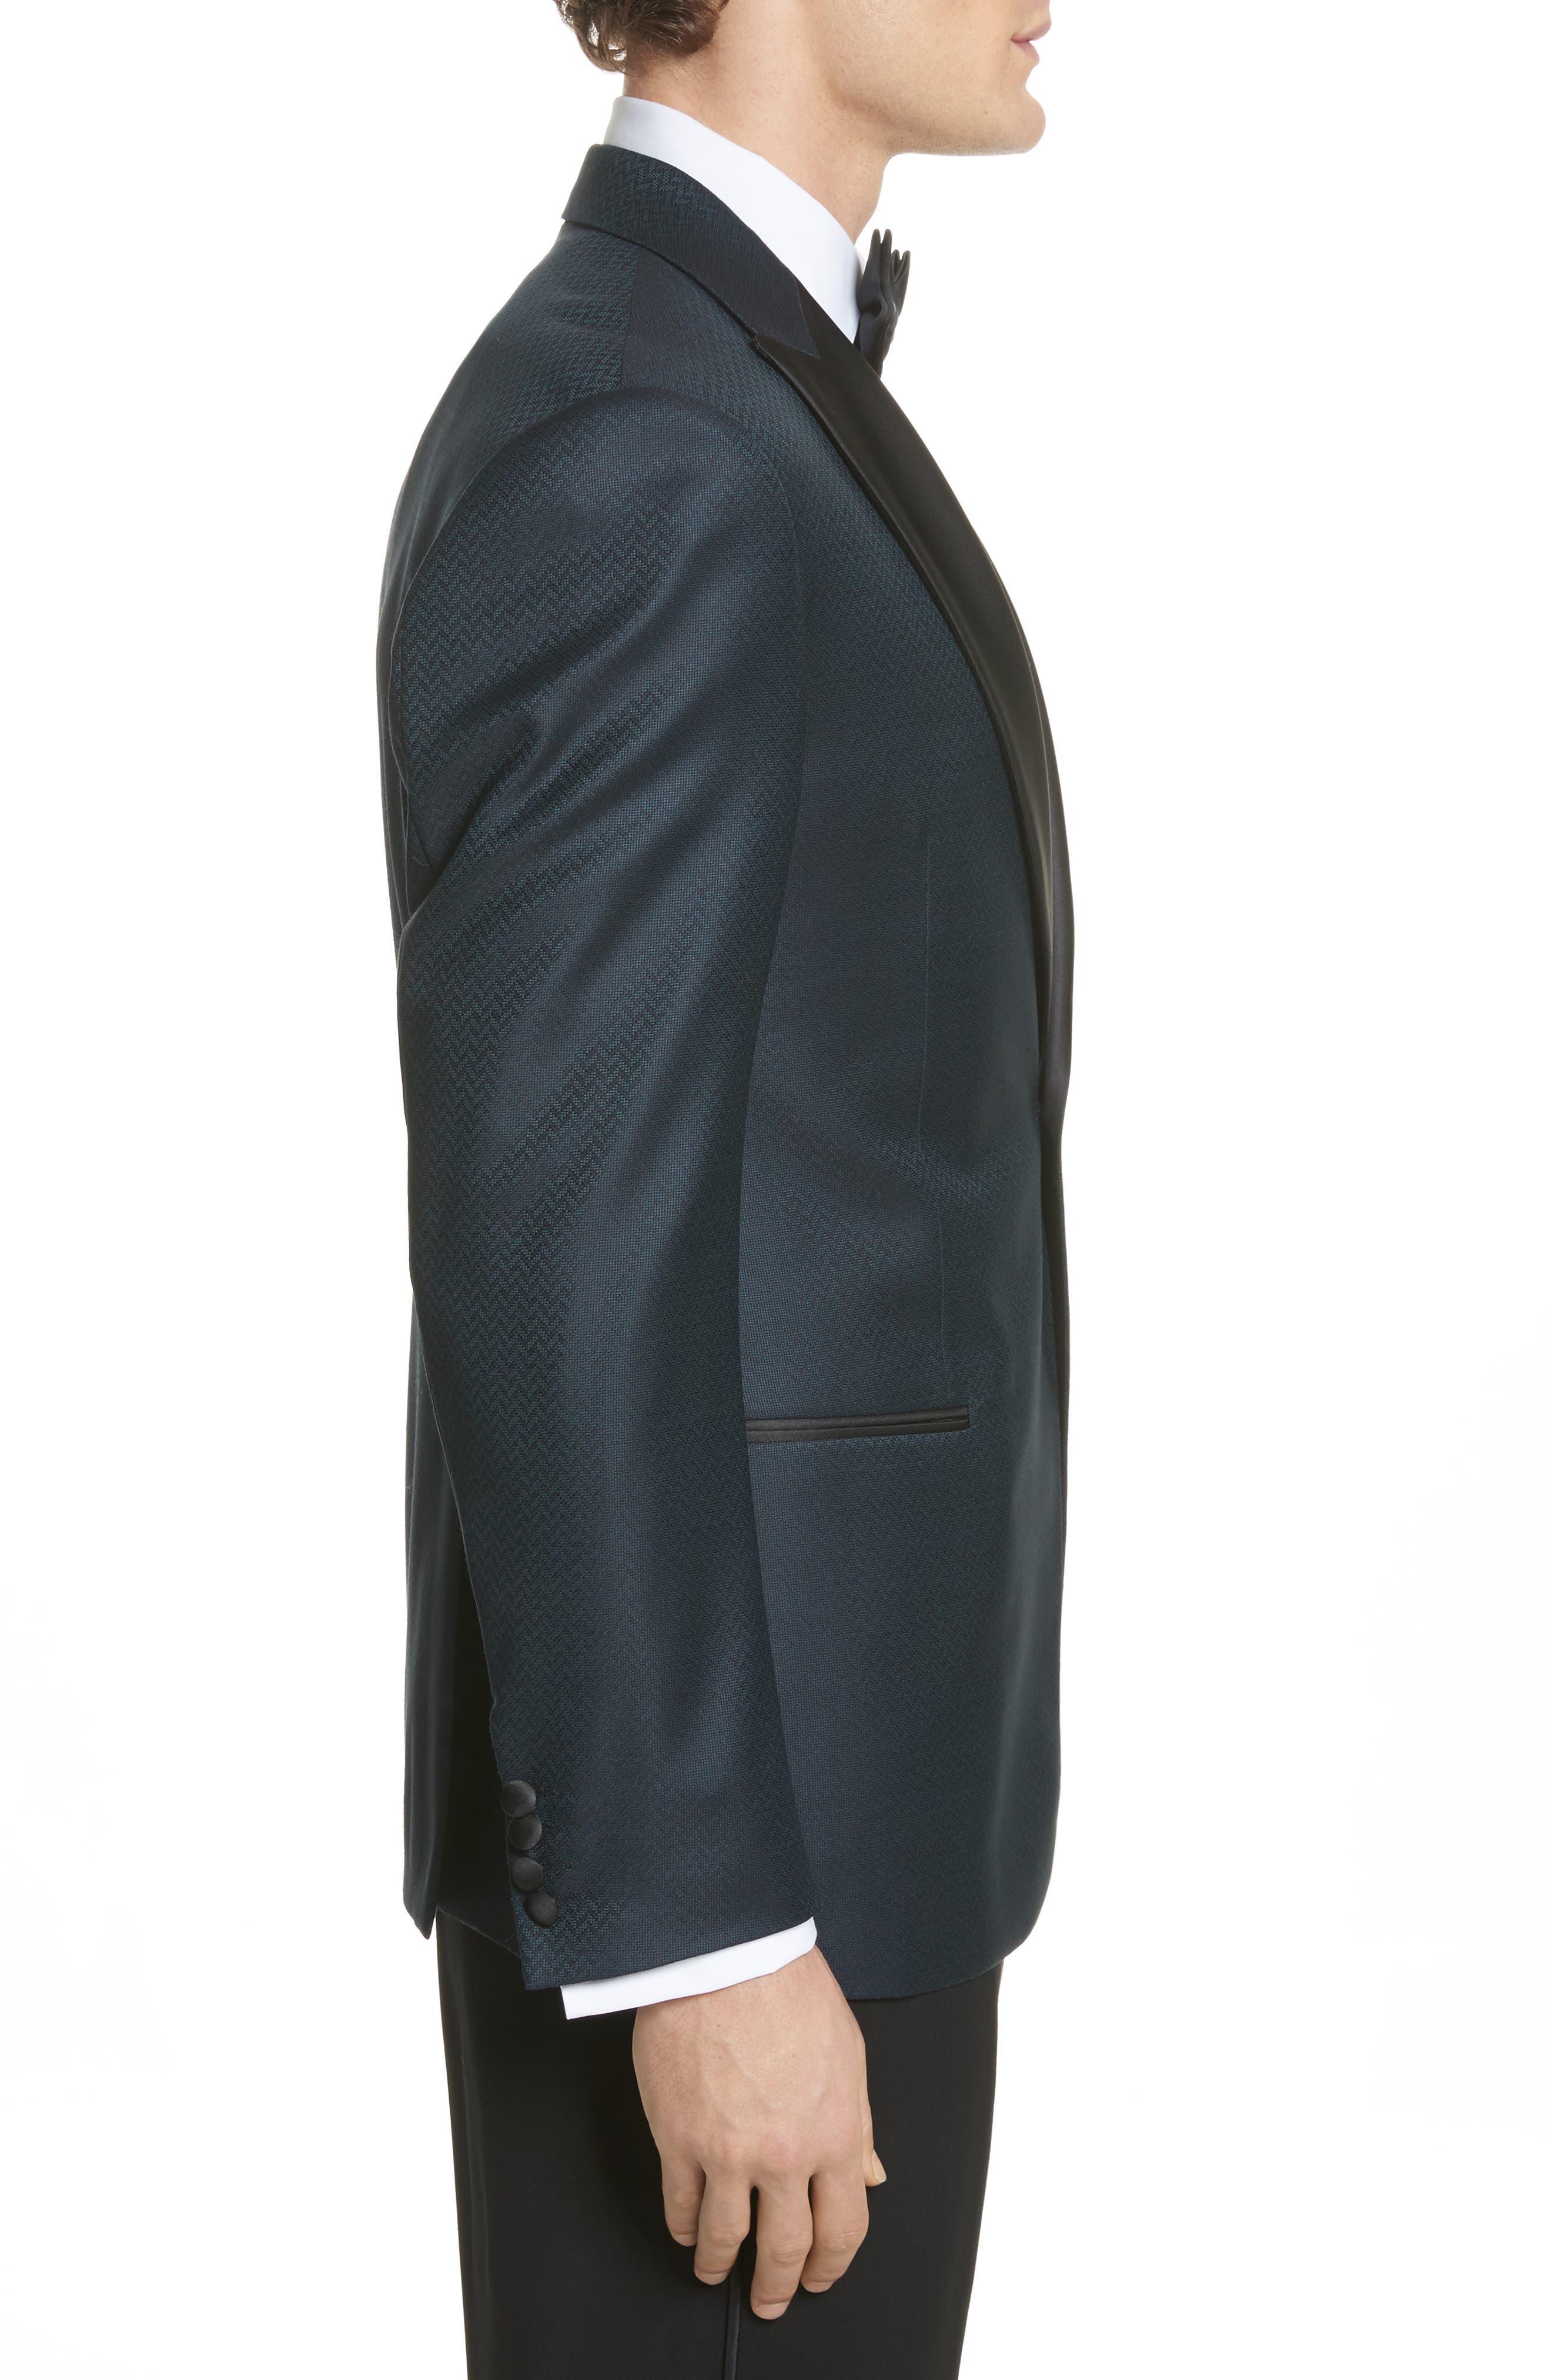 G-Line Trim Fit Wool Dinner Jacket,                             Alternate thumbnail 3, color,                             459